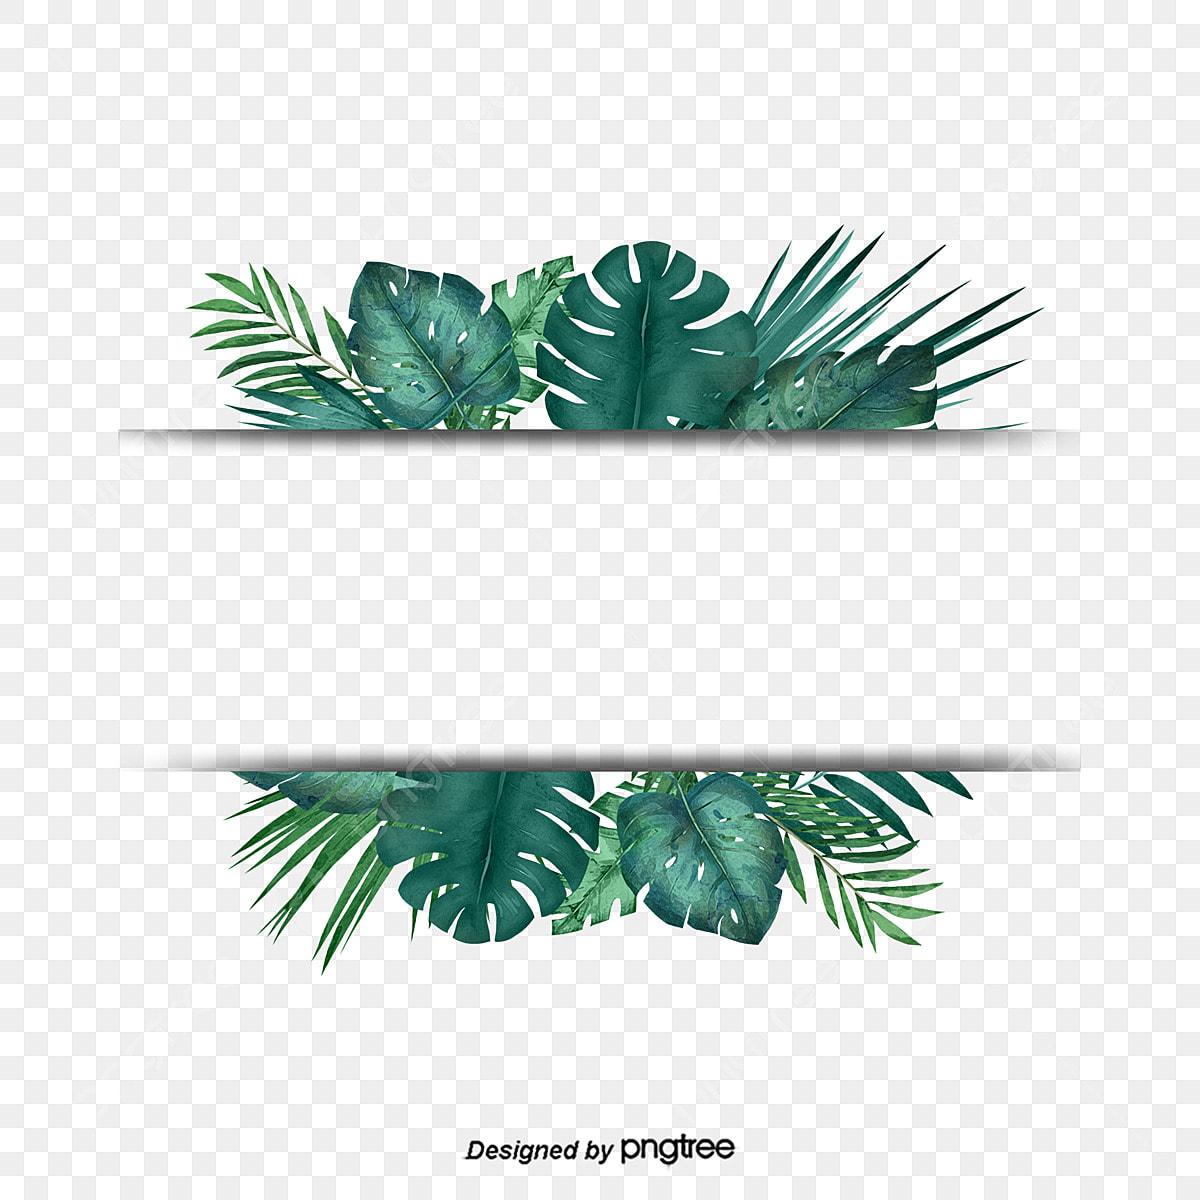 Green Tropical Plant Palm Leaf Border Border Clipart Palm Leaf Botany Png Transparent Clipart Image And Psd File For Free Download Blue tropical leaves background png image. https pngtree com freepng green tropical plant palm leaf border 3791397 html